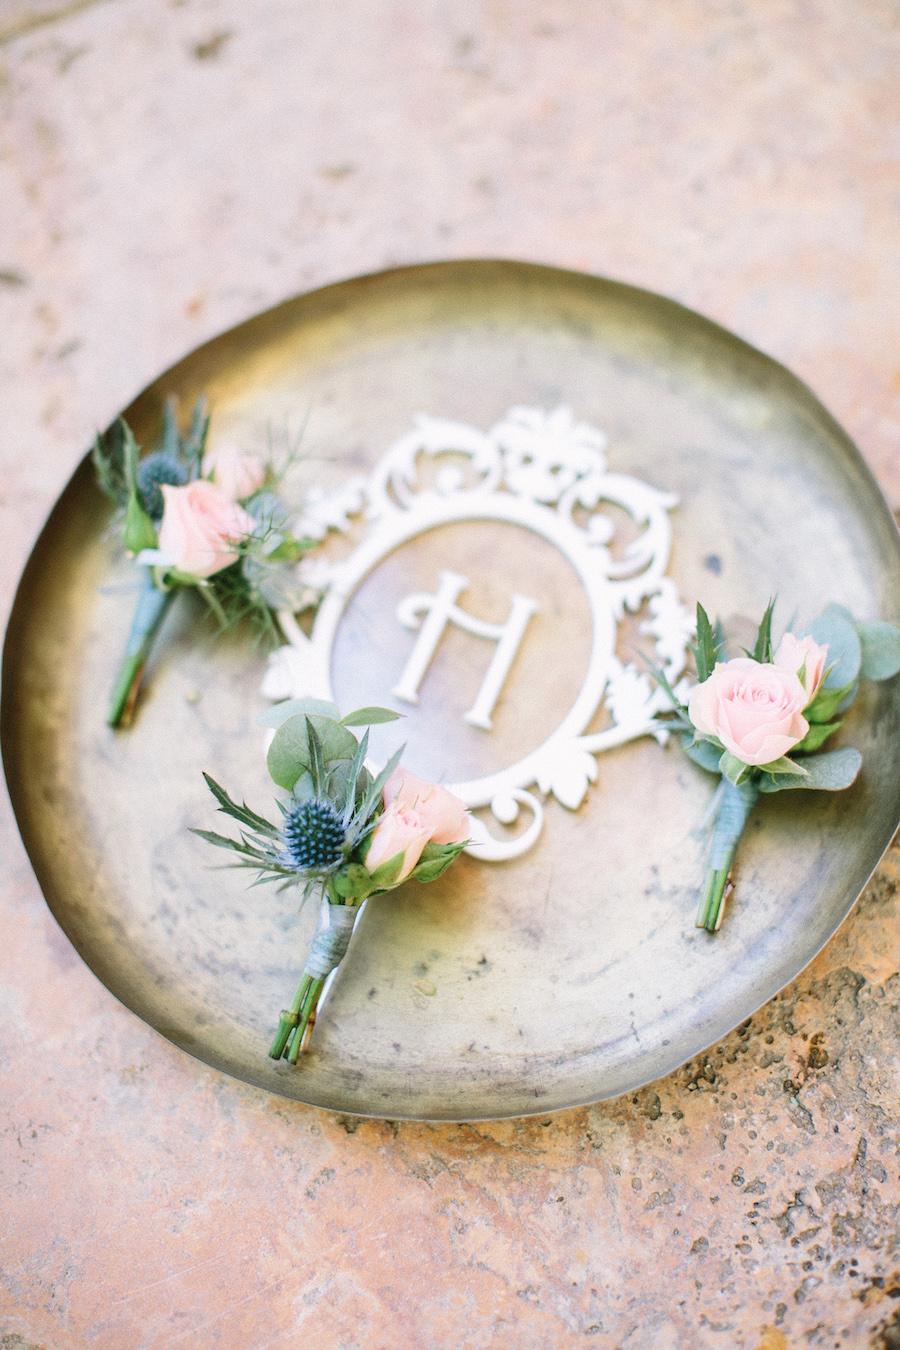 saya-photography-jewish-wedding-provence-rustic-lourmarin-le-galinier-14.jpg